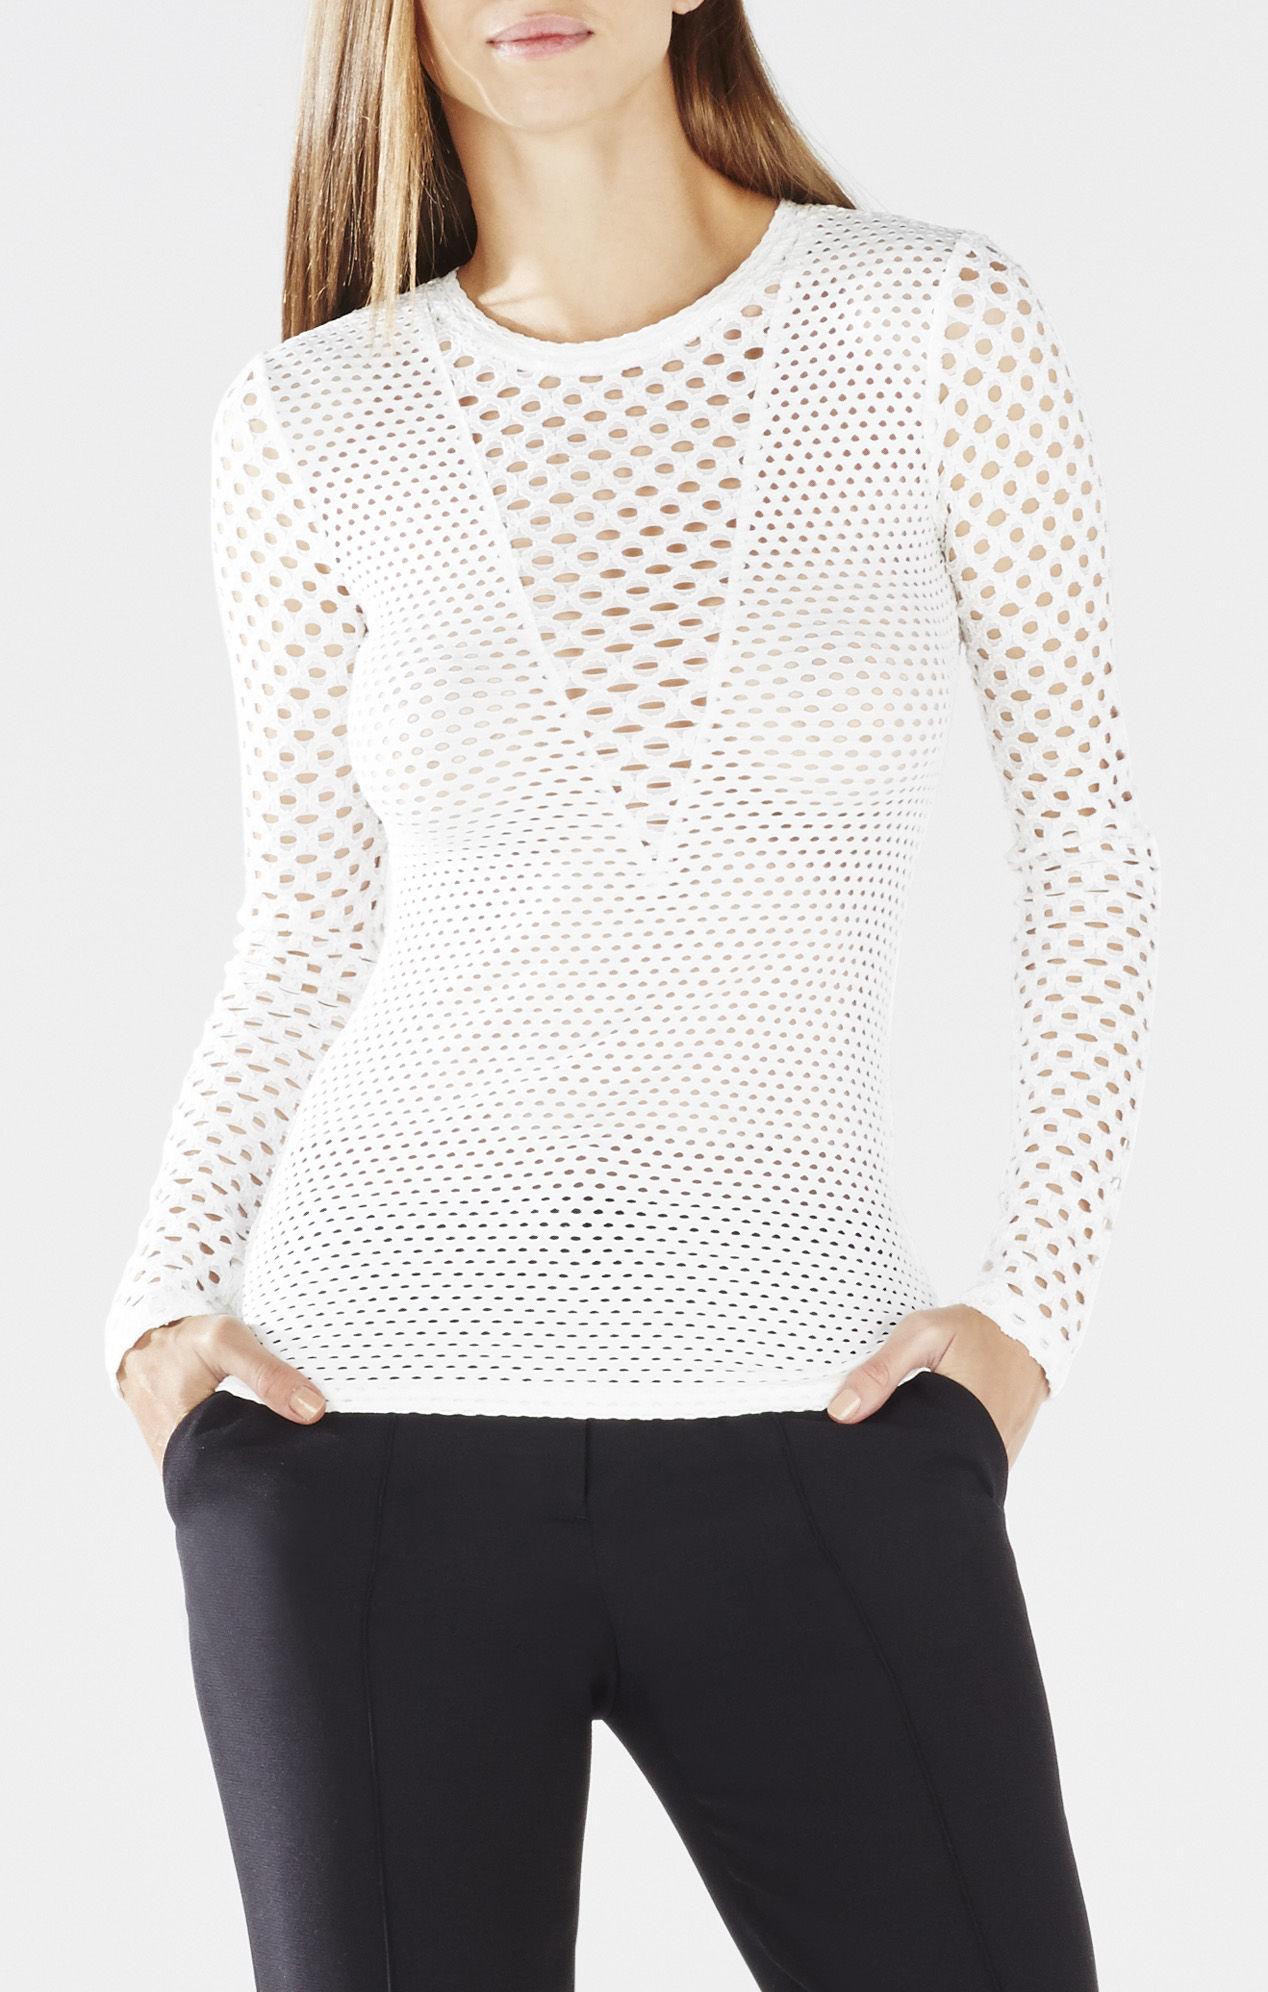 Lyst - BCBGMAXAZRIA Elain Long-sleeve Lace Top in White